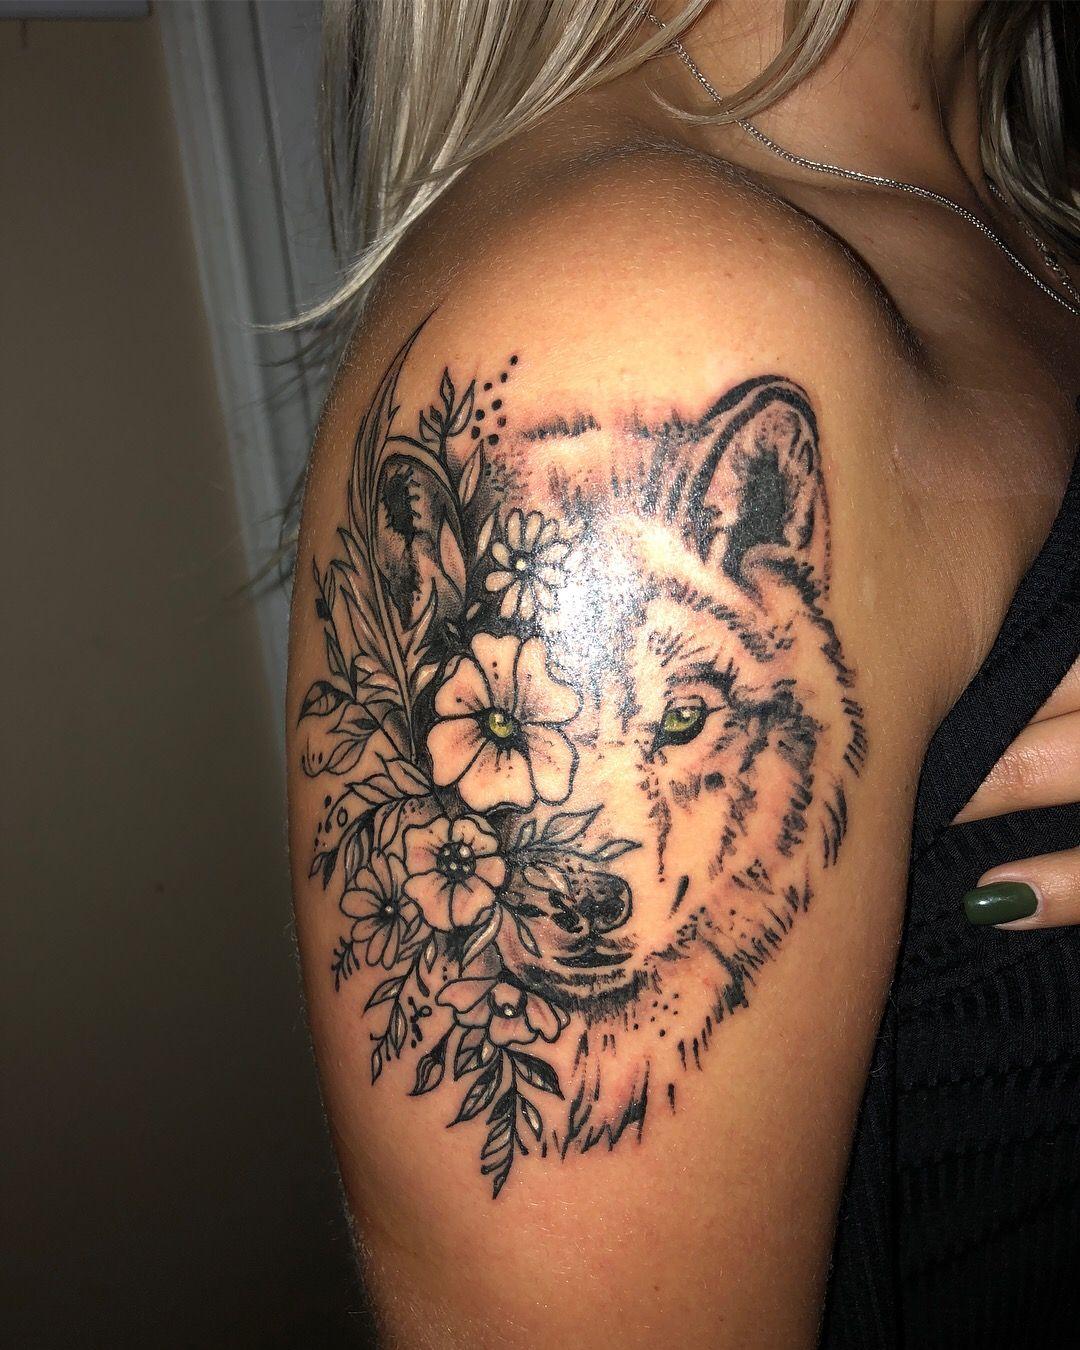 Wolf Stomach Tattoo Belly Tattoos Stomach Tattoos Women Tattoos For Women